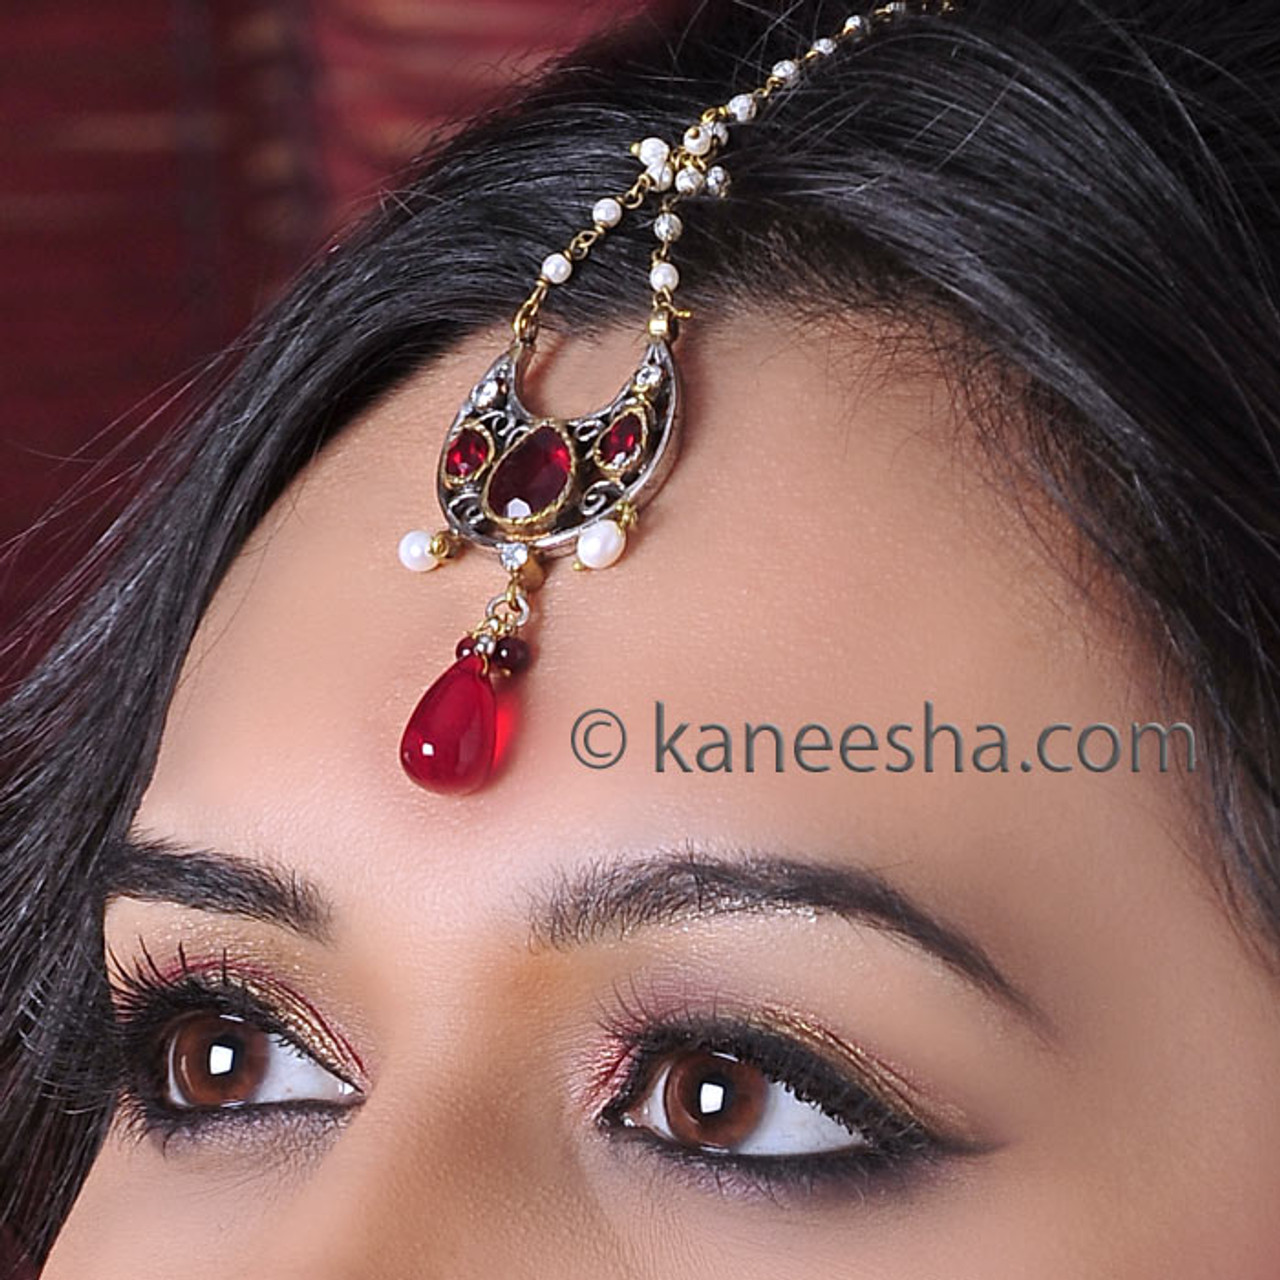 Indian Tikka Jewelry With Red Stones Www Kaneesha Com